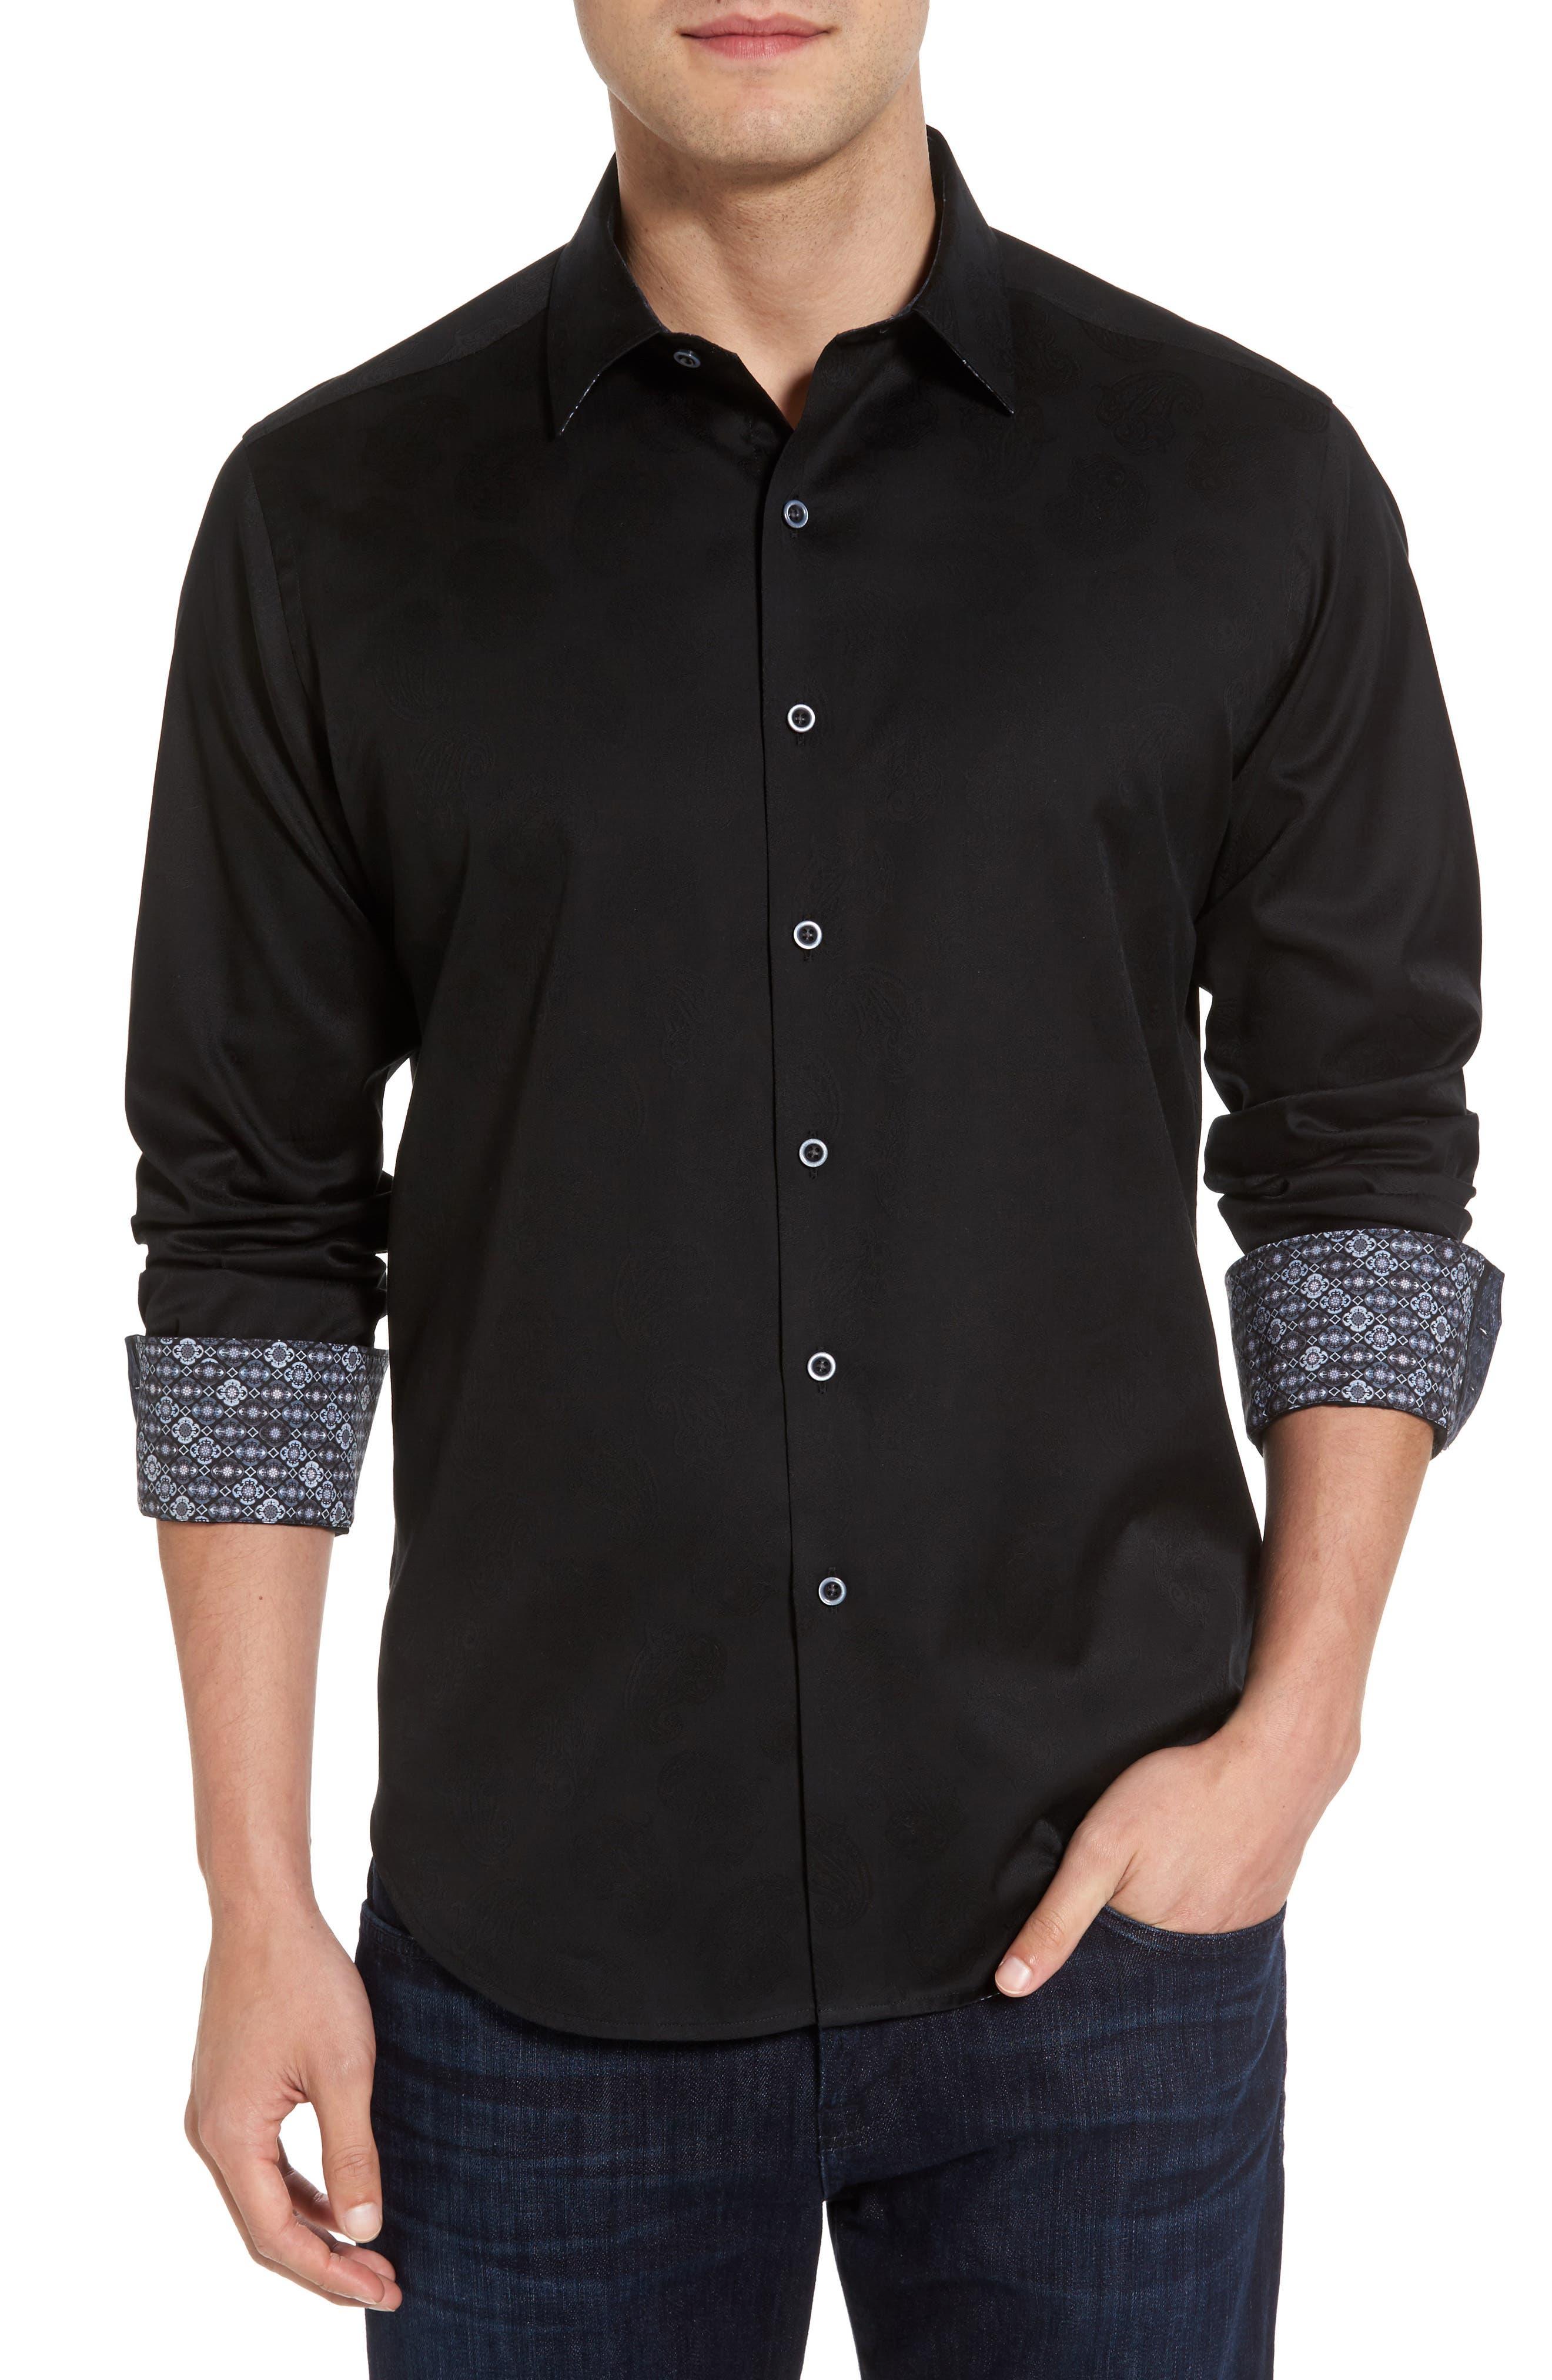 Robert Stack Haystack Regular Fit Jacquard Sport Shirt (Tall)